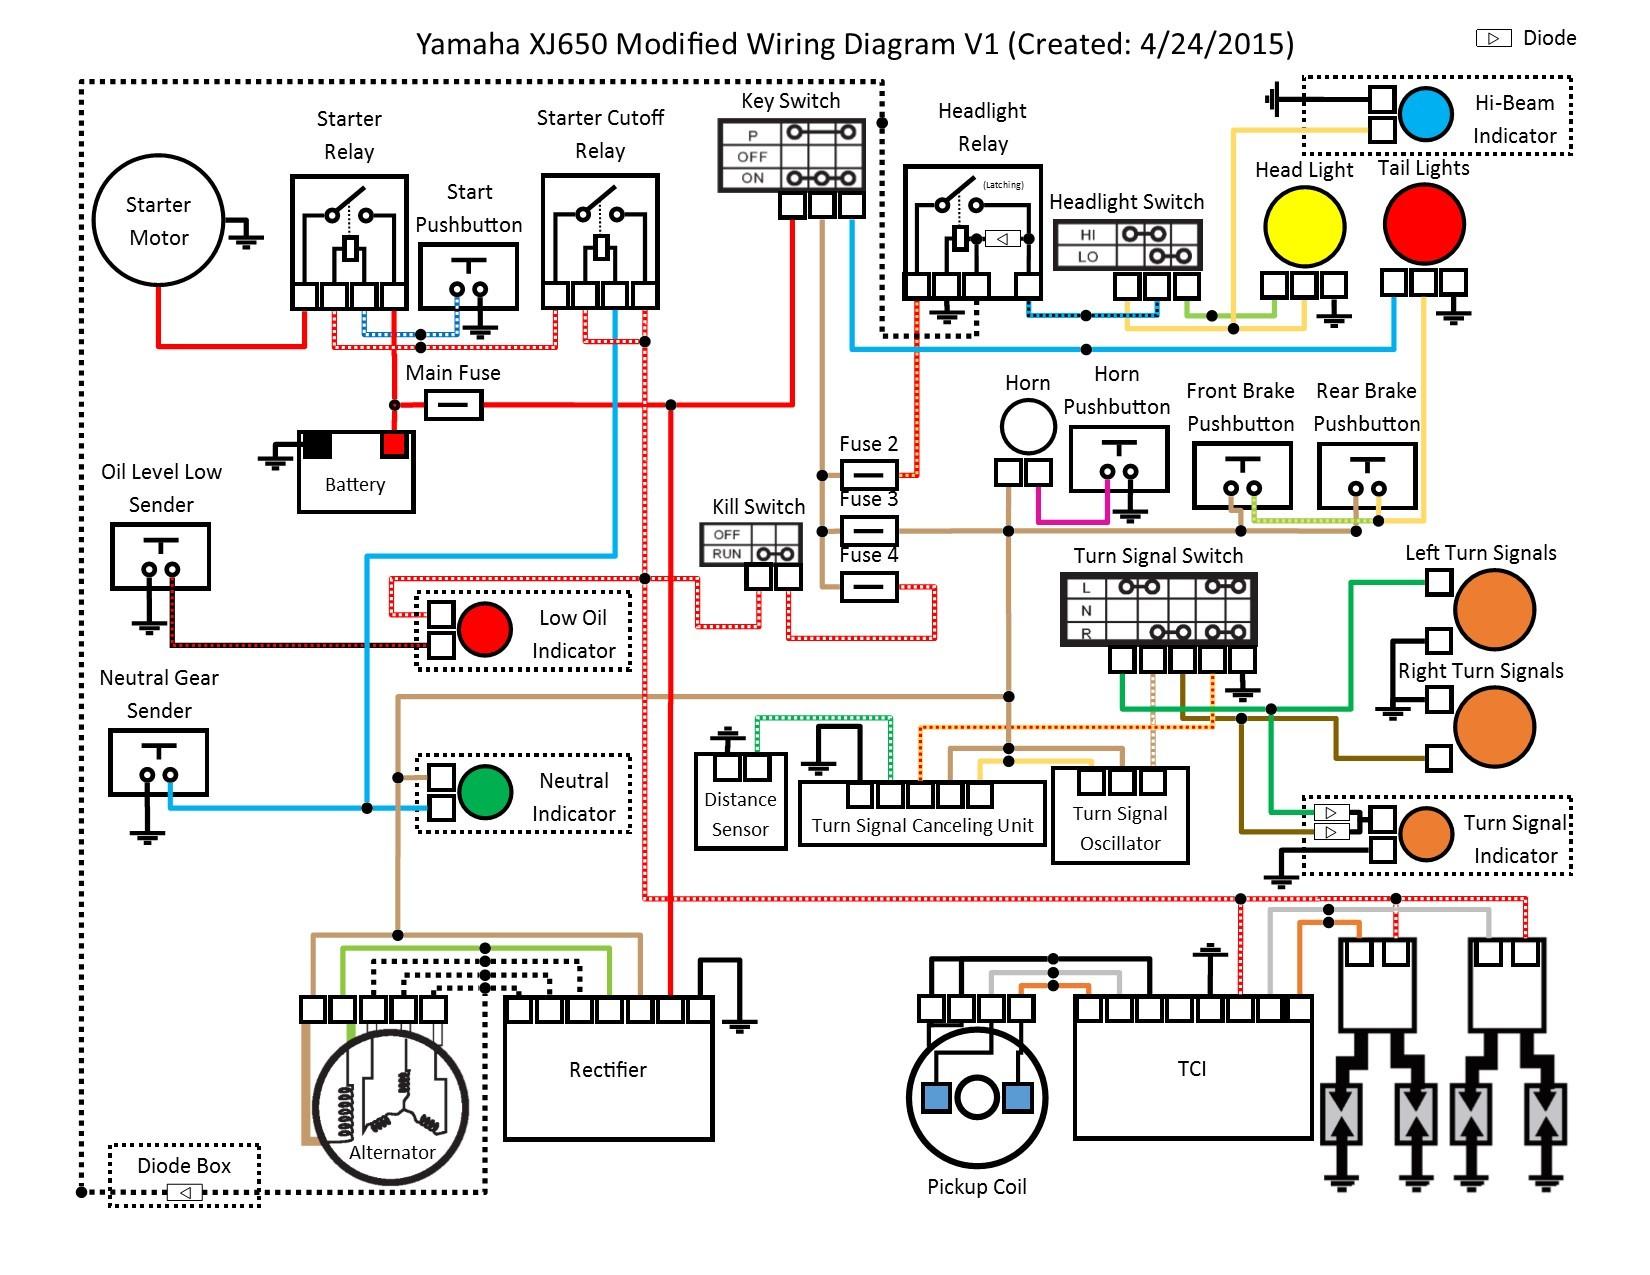 yamaha engine diagram yamaha 650 maxim wiring diagram view diagram rh detoxicrecenze com